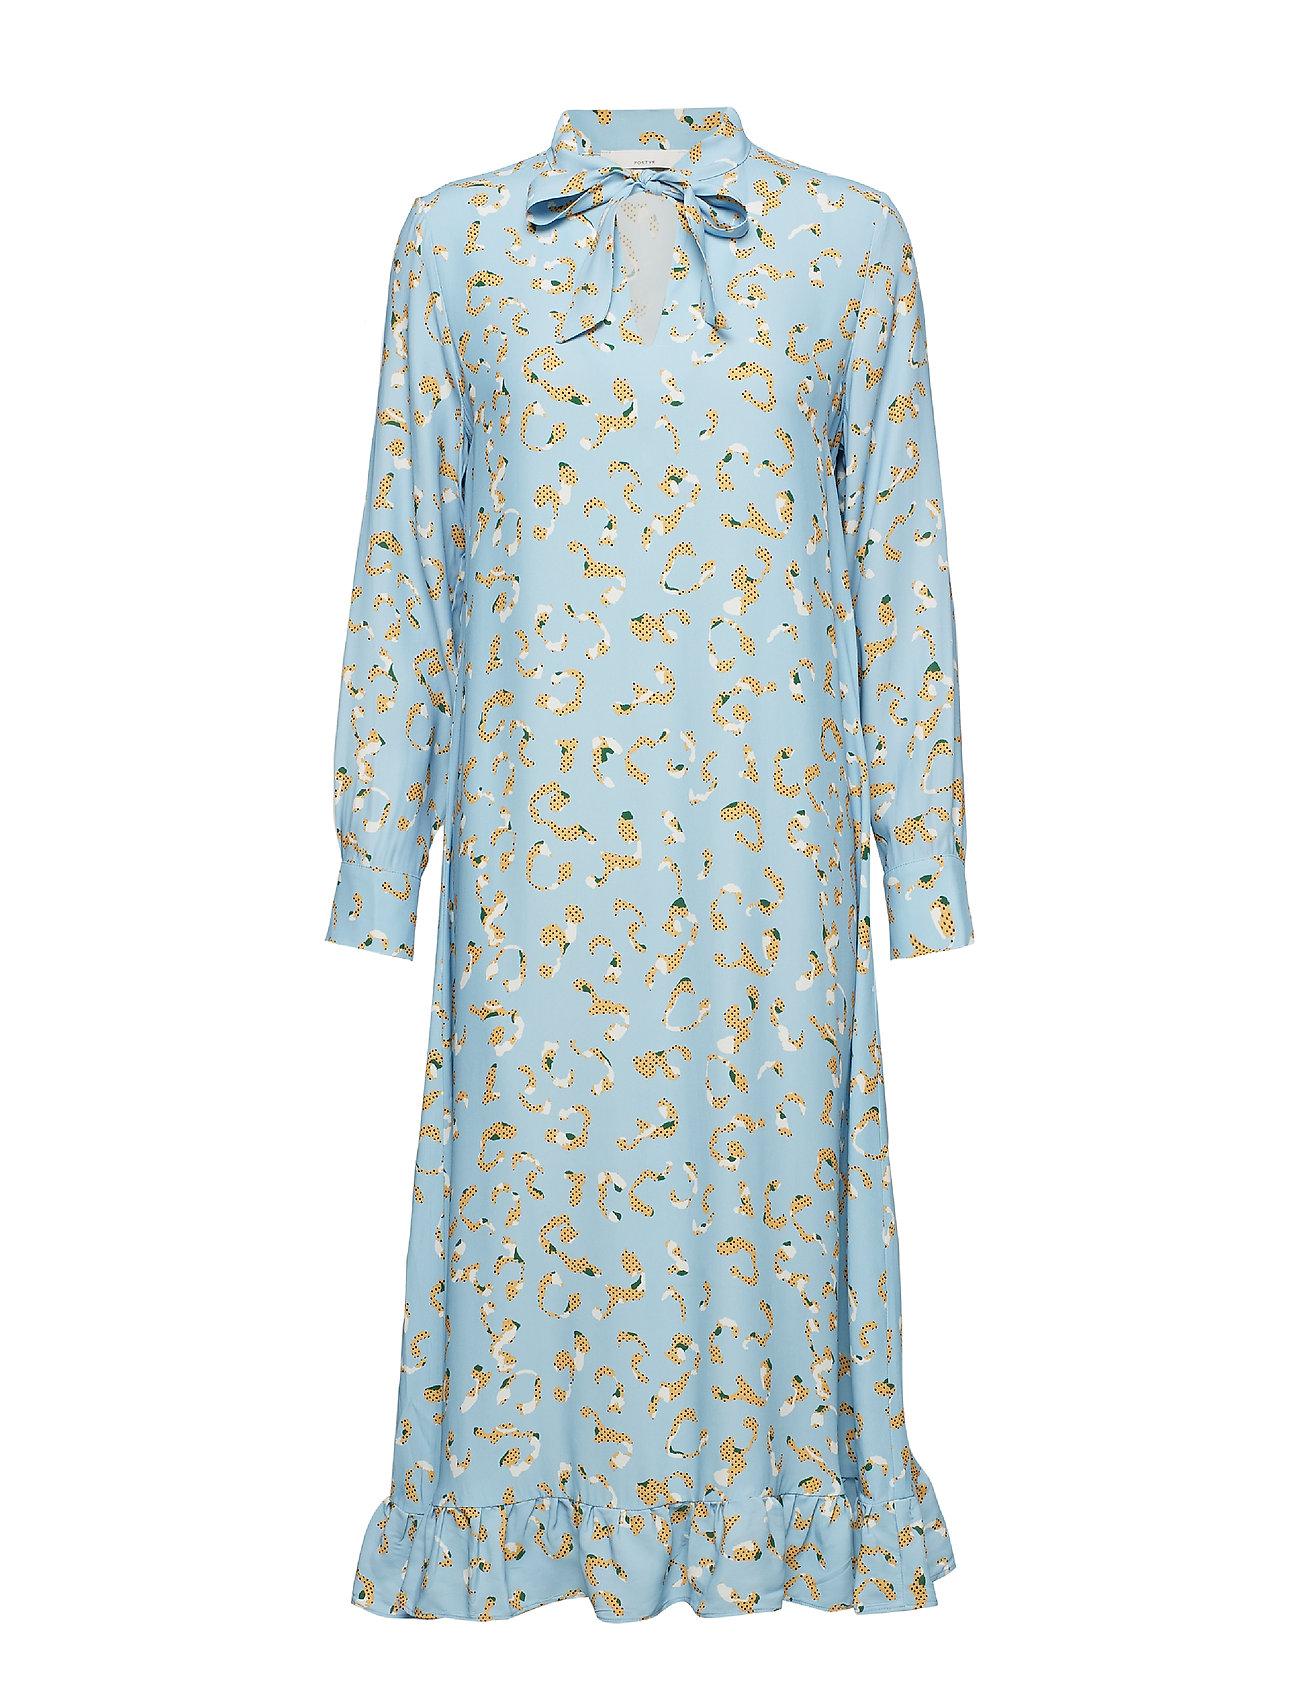 POSTYR POSLAURETTE LONG DRESS - PLACID BLUE